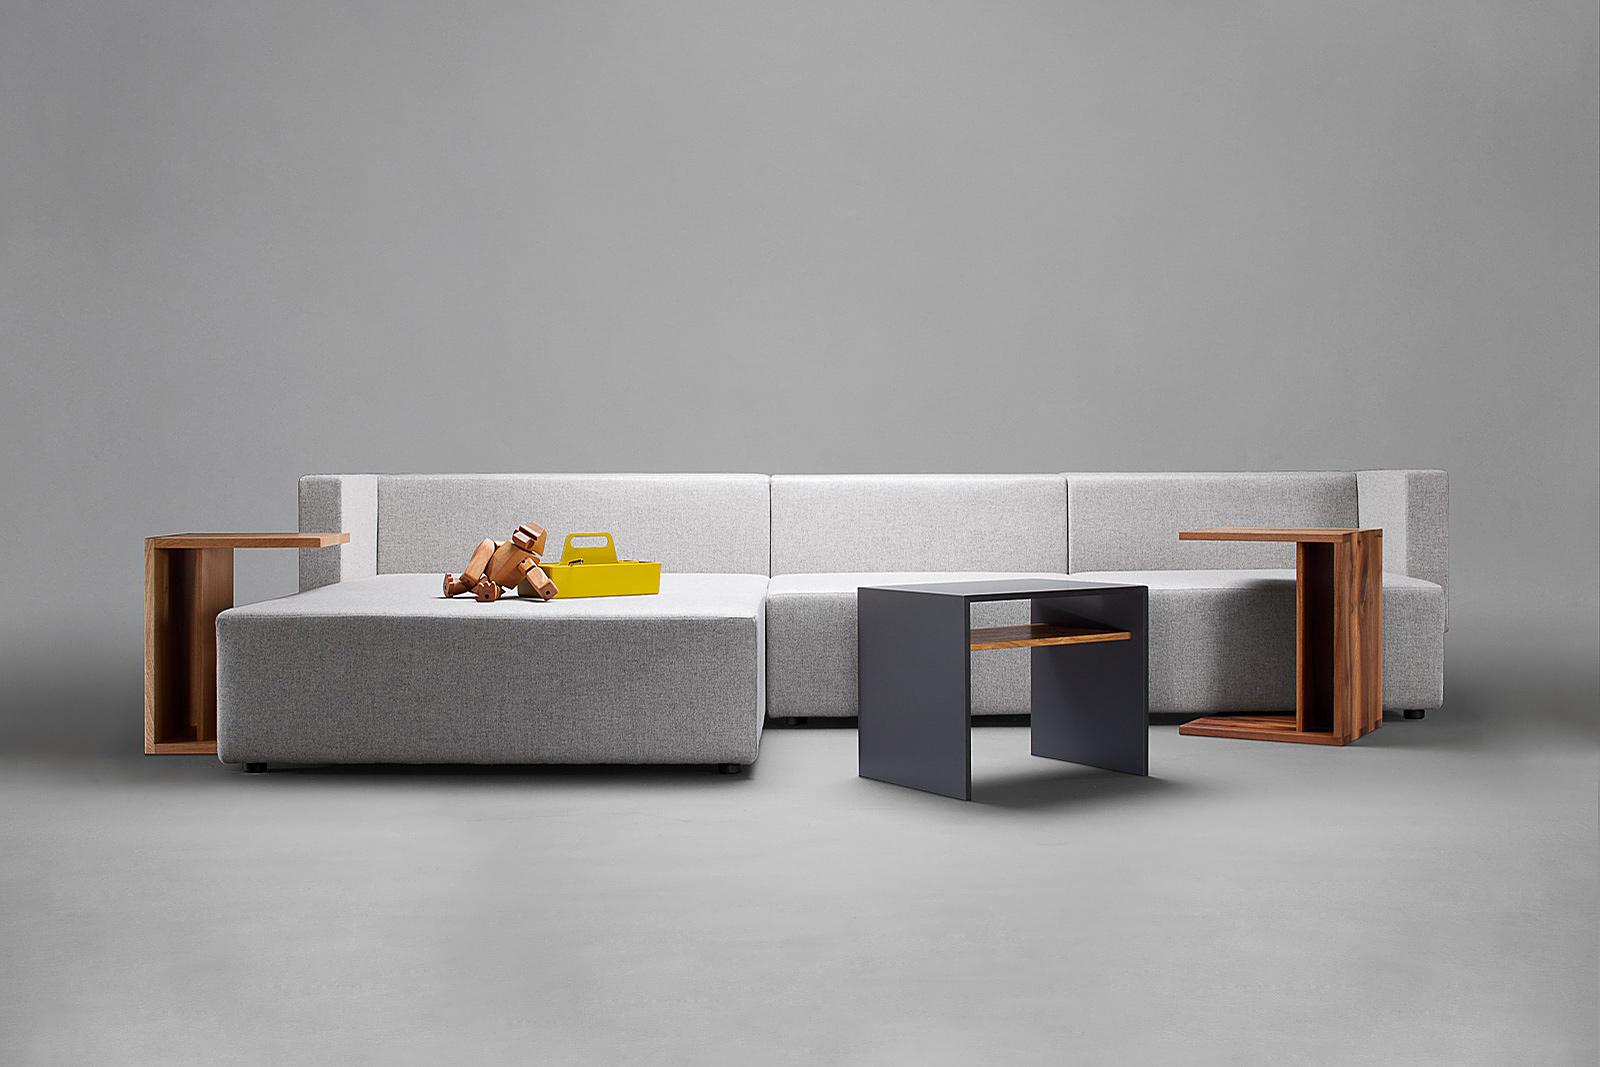 Werbefotografie, JANUA Möbel, Design aus Bayern